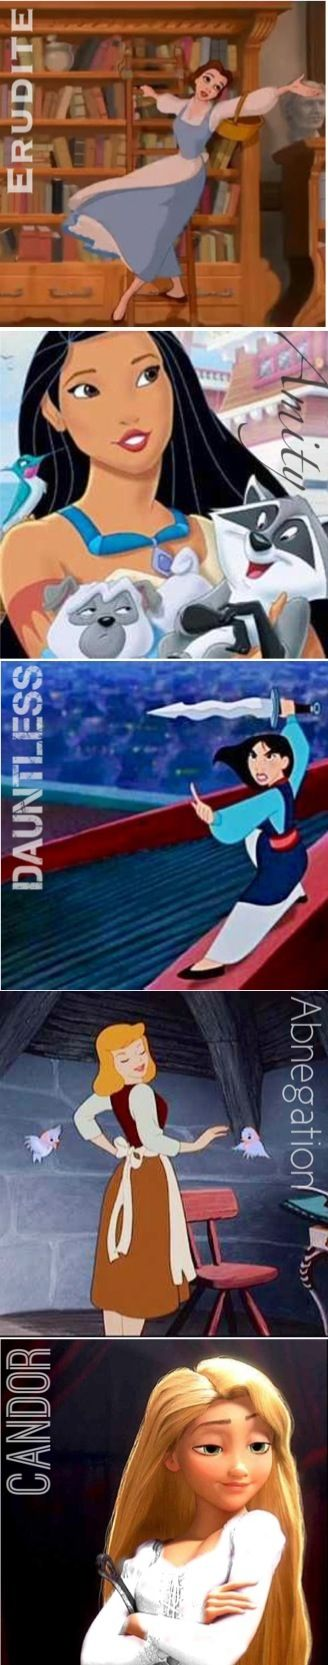 If Disney went Divergent! ~Divergent~ ~Insurgent~ ~Allegiant~